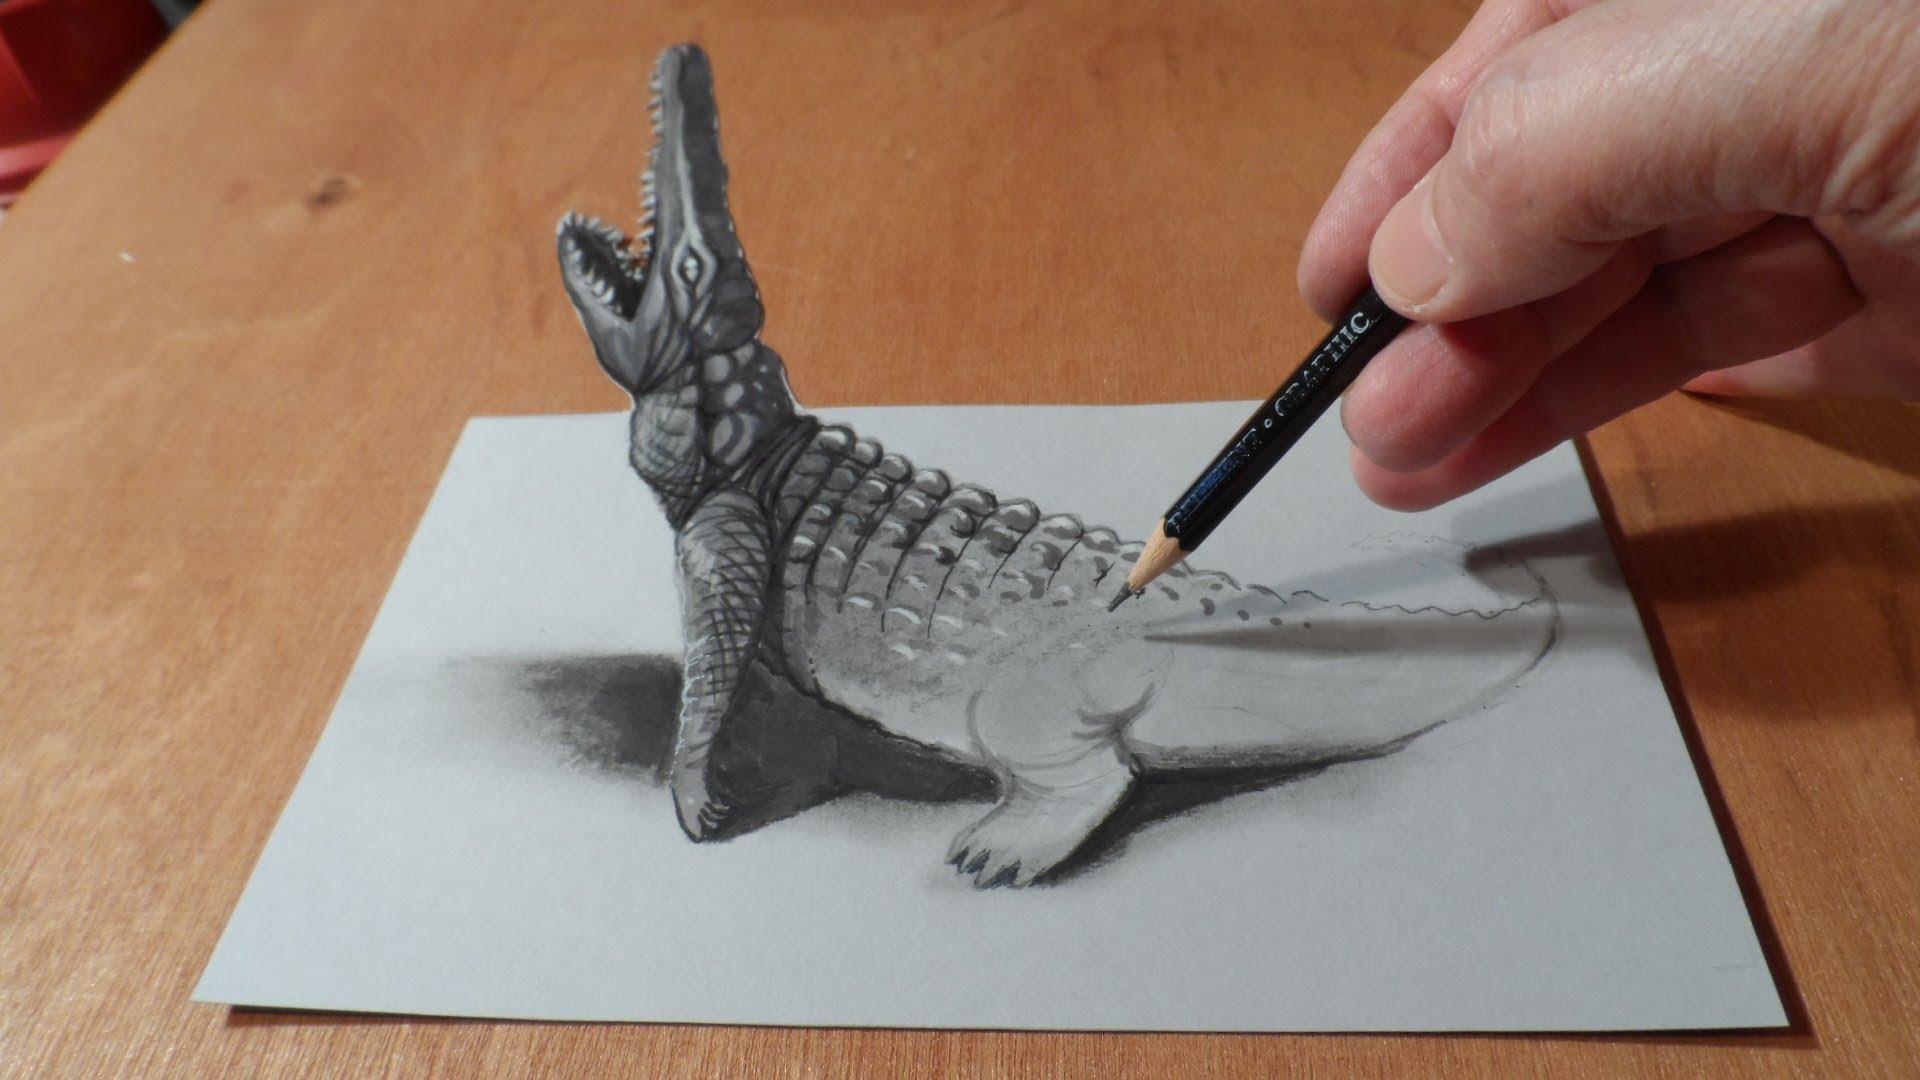 1920x1080 How To Draw Crocodile